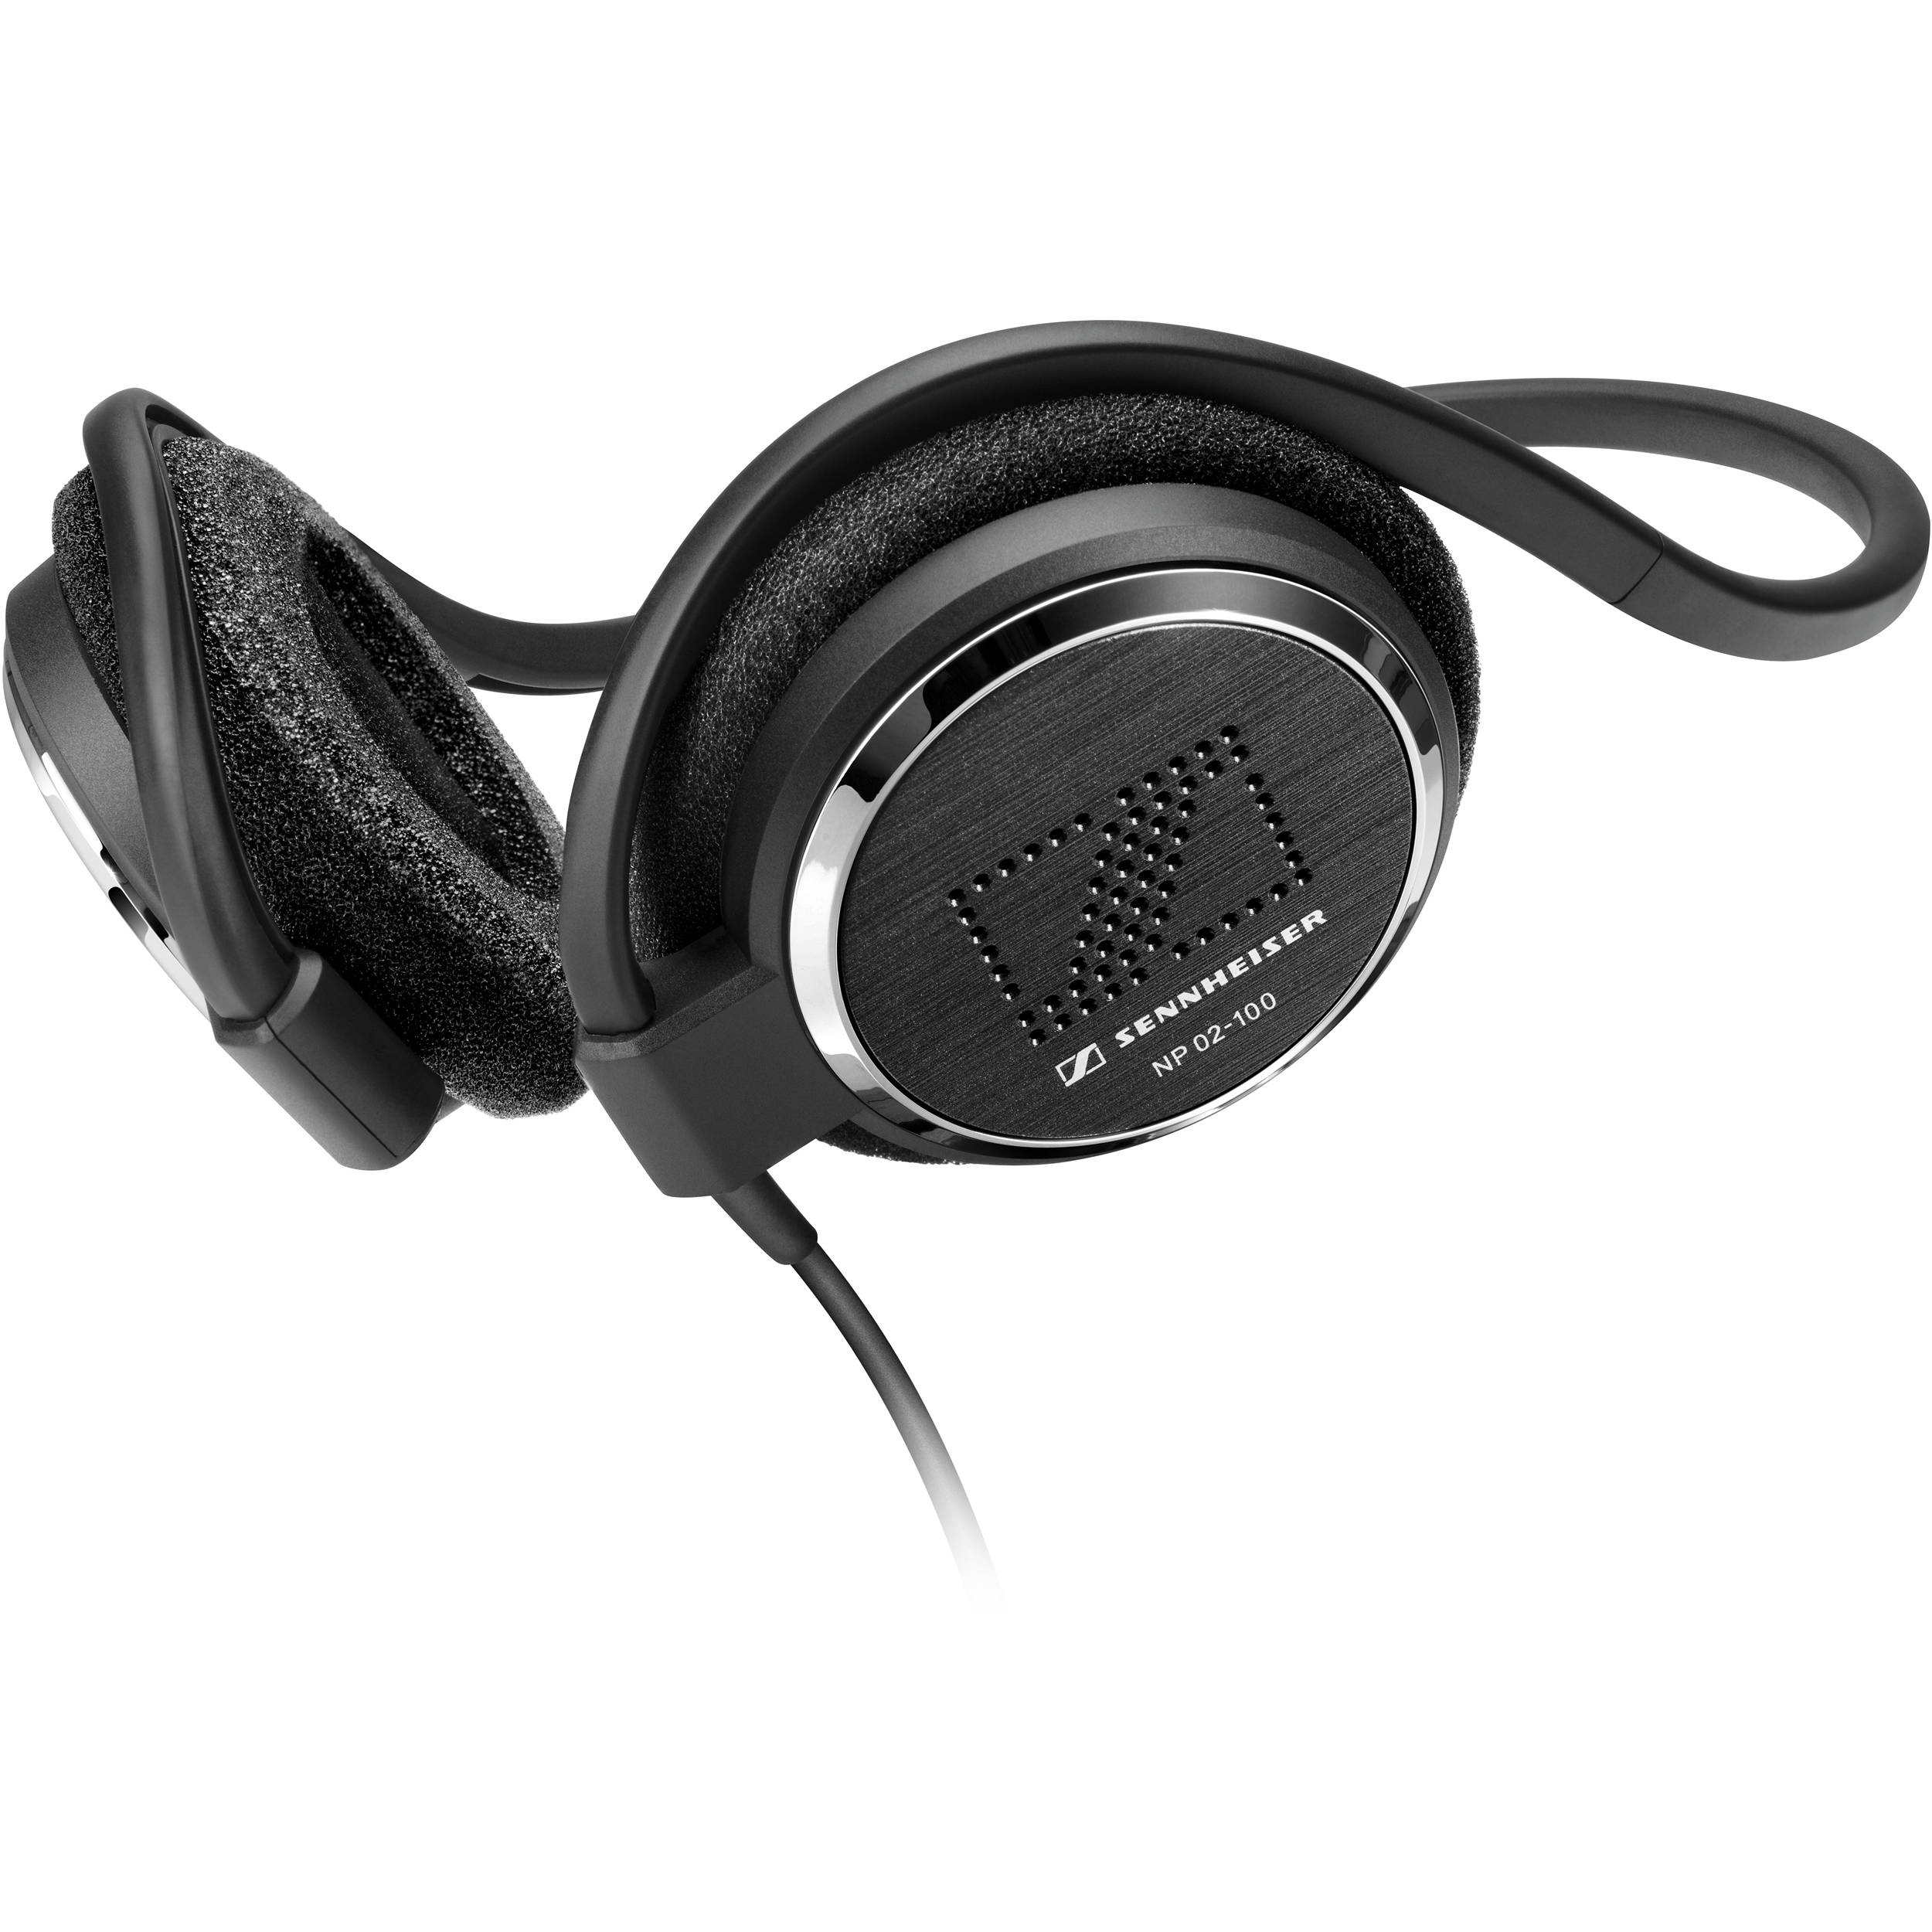 sennheiser np 02 100 neckband stereo headphones 20 pack 505967. Black Bedroom Furniture Sets. Home Design Ideas